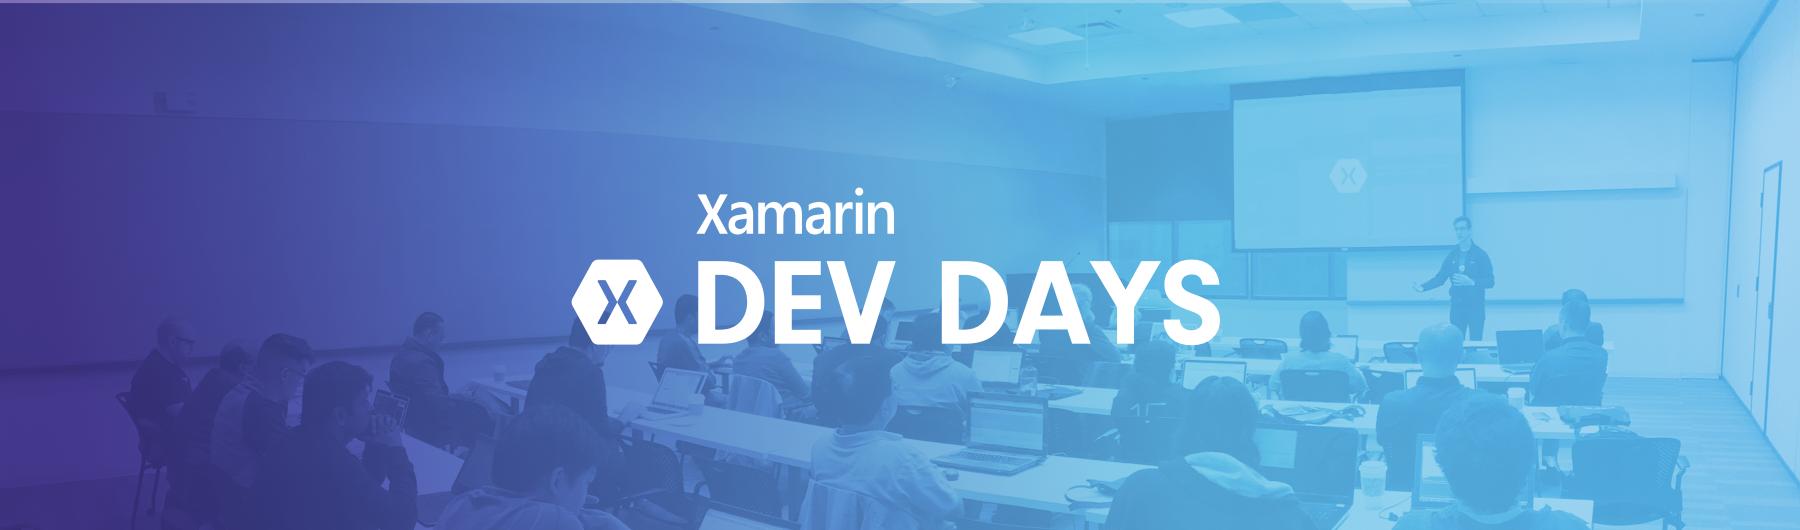 Xamarin Dev Days - Tampa